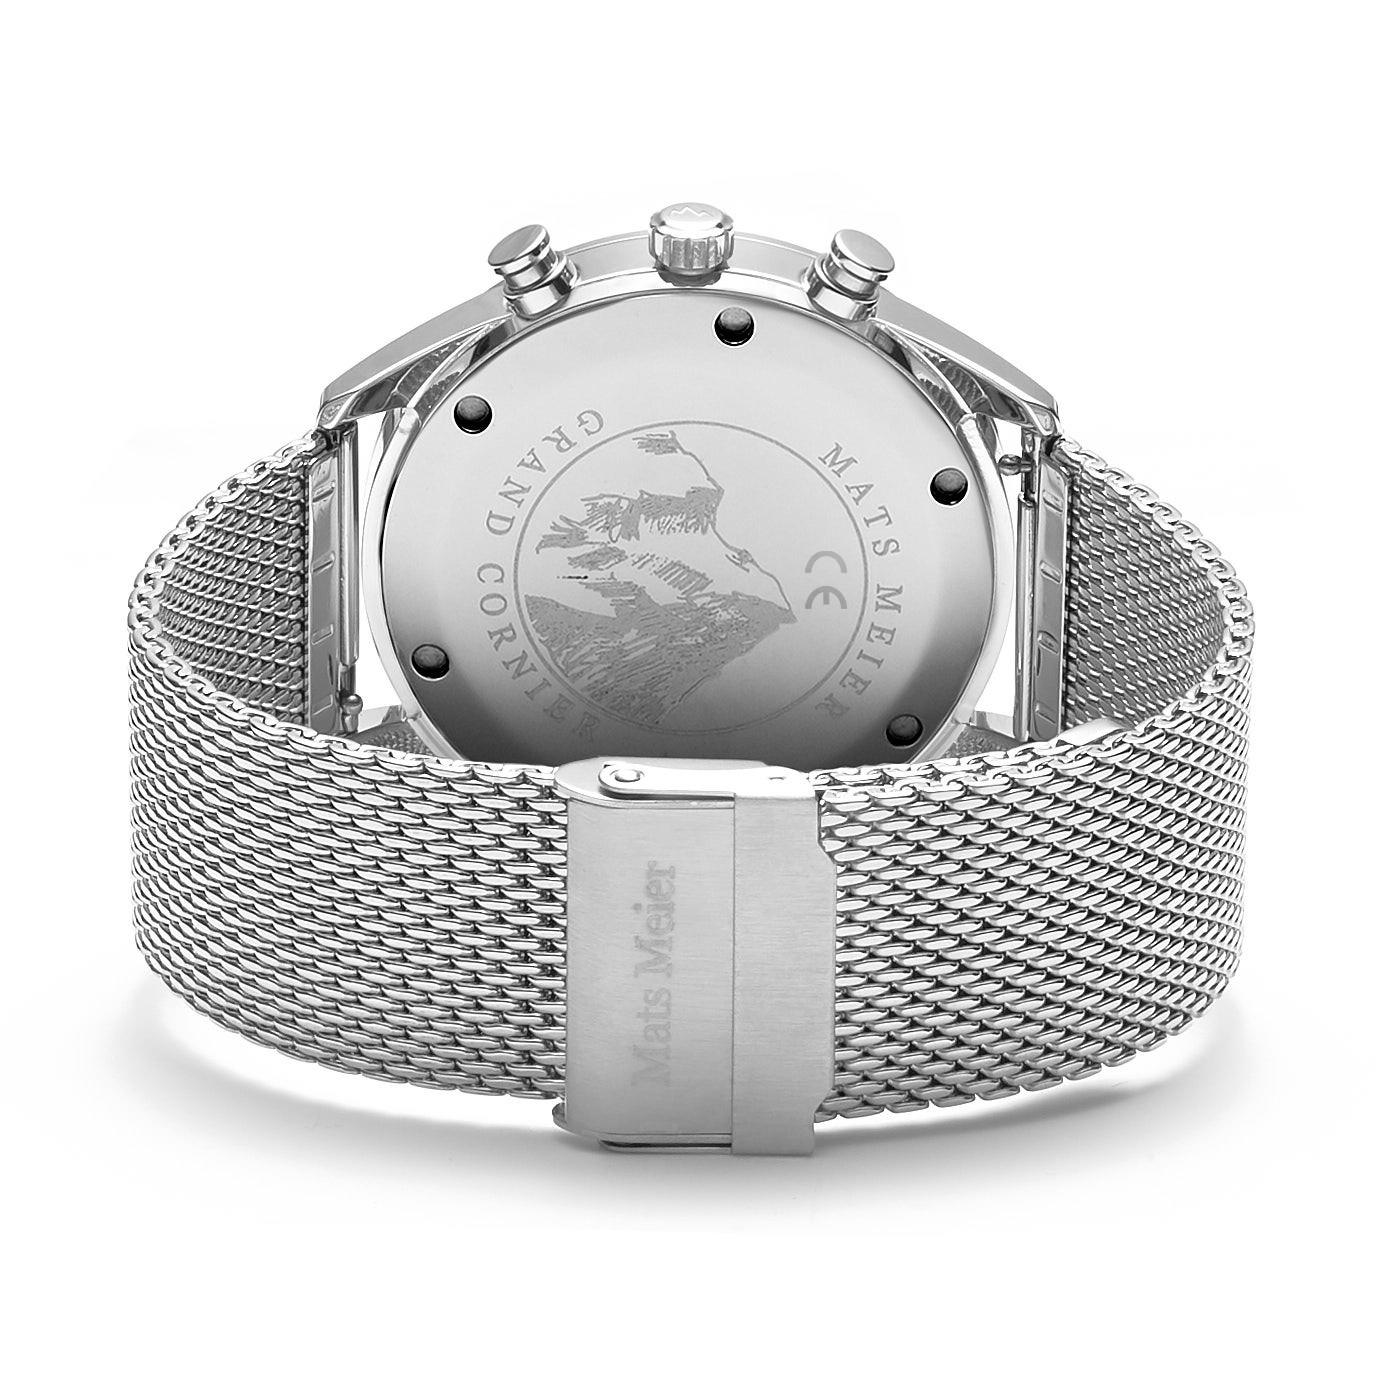 Mats Meier Grand Cornier chronograph mens watch blue / silver colored mesh